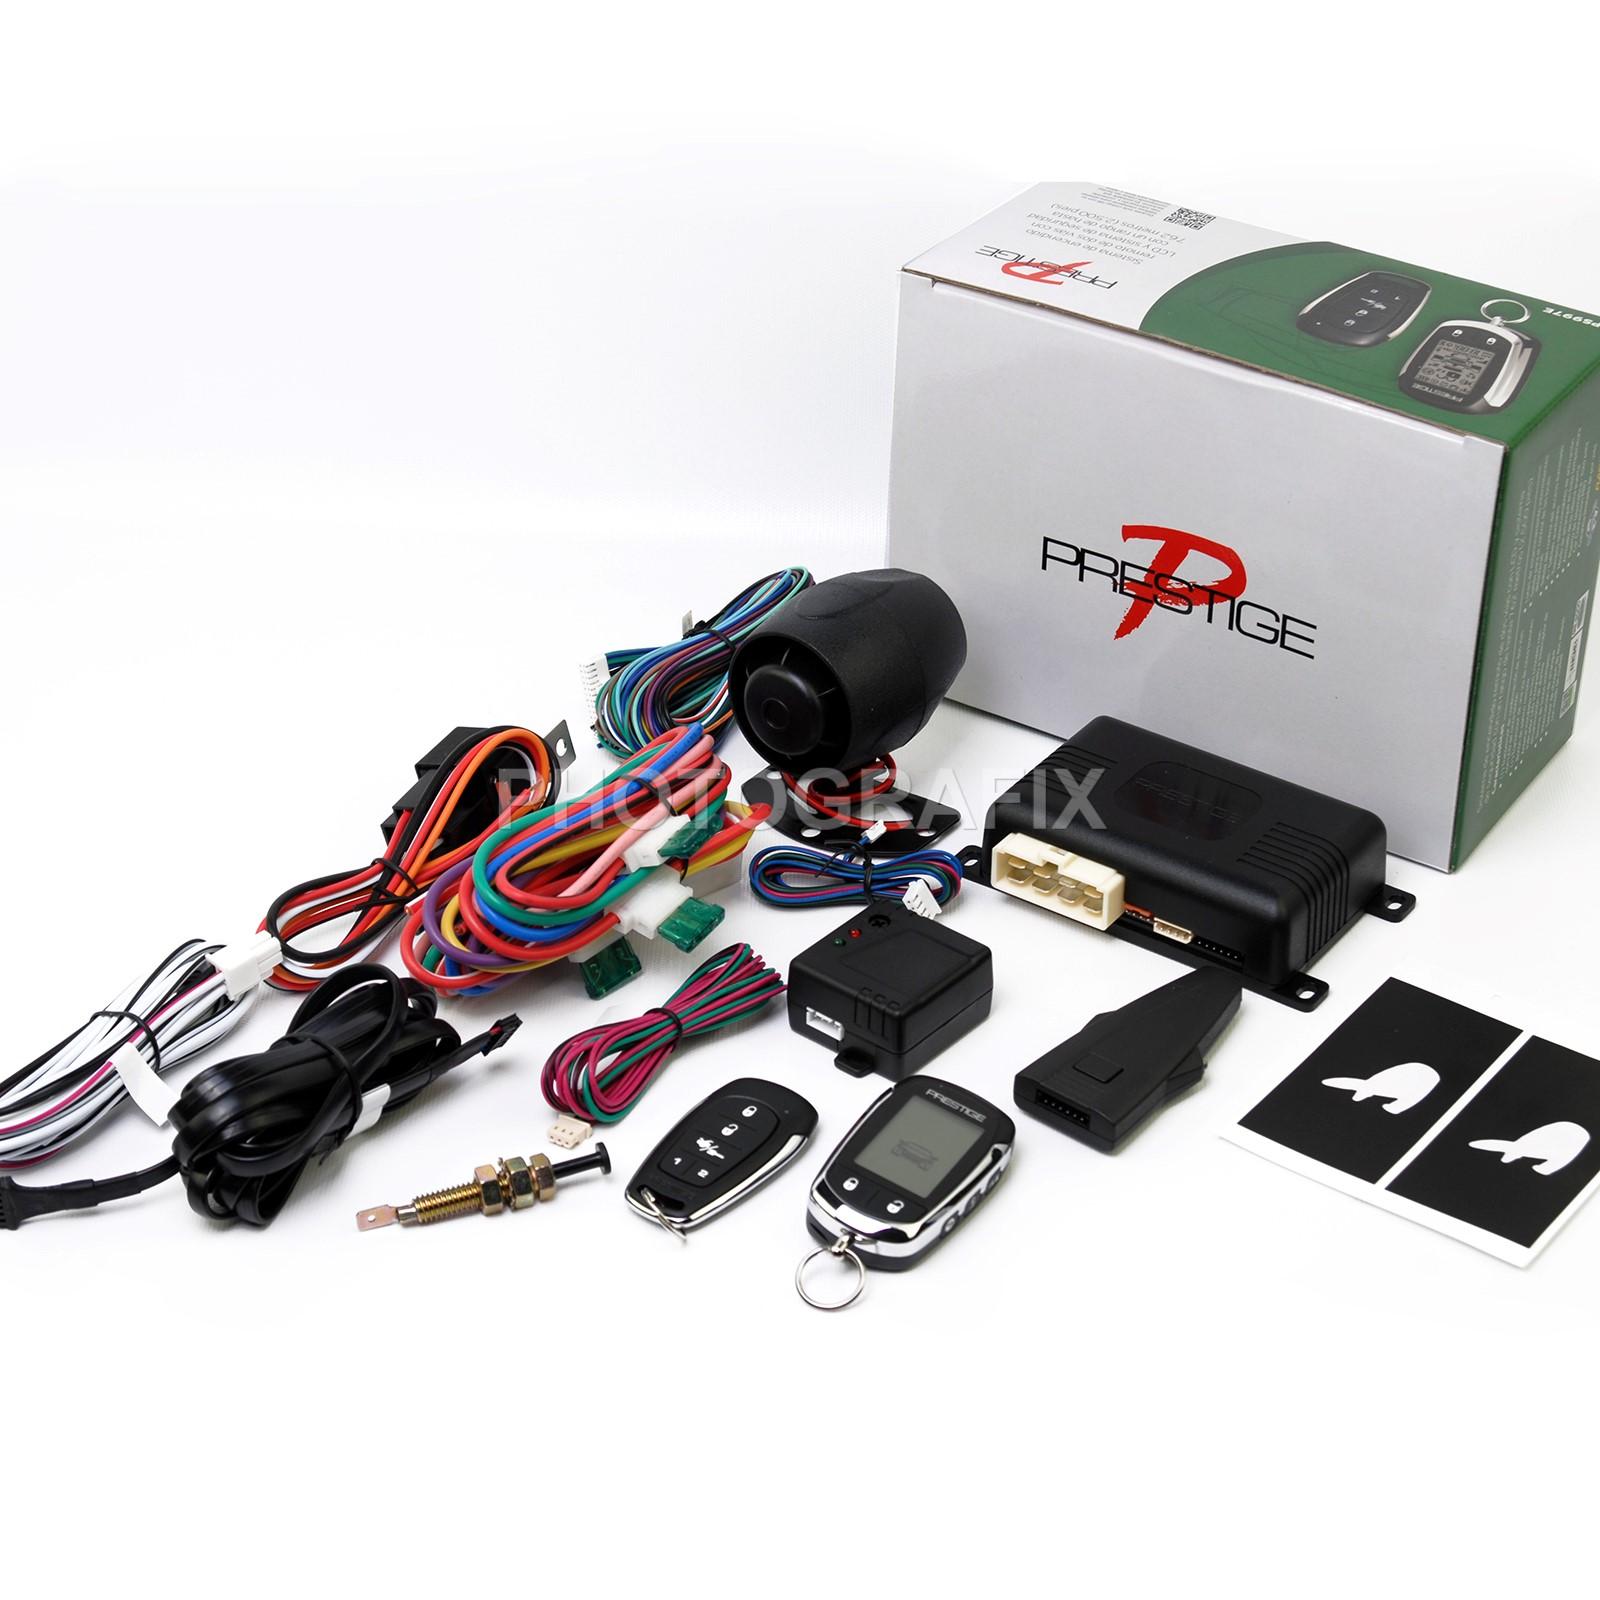 Audiovox prestige aps997ec 2 way lcd remote start & alarm system on audiovox car alarm wiring diagram Remote Starter Wiring Diagrams Audiovox Car Alarm APS25C Wiring-Diagram